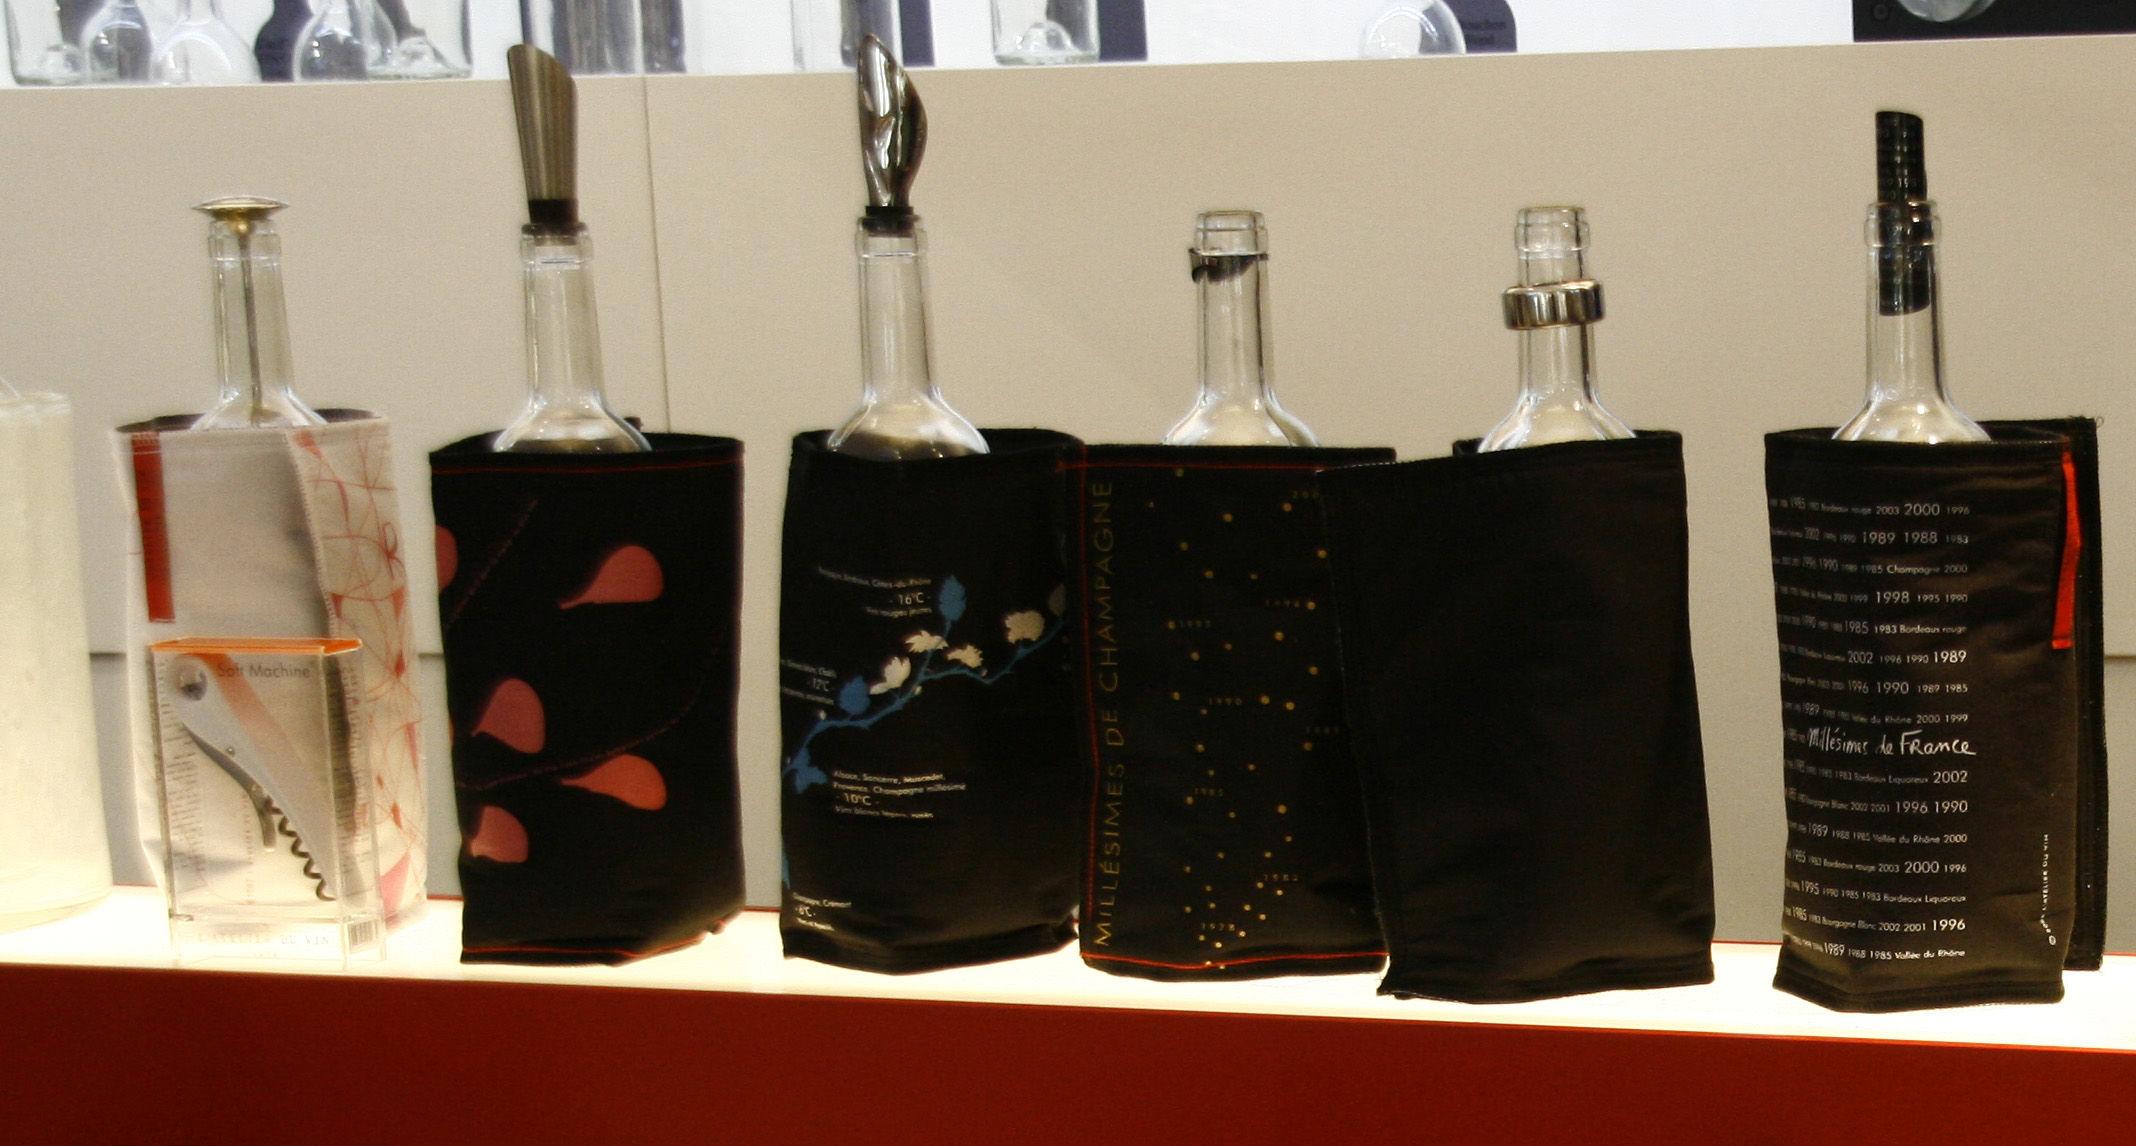 rafra chisseur bouteille fresh mill simes de france noir l 39 atelier du vin. Black Bedroom Furniture Sets. Home Design Ideas